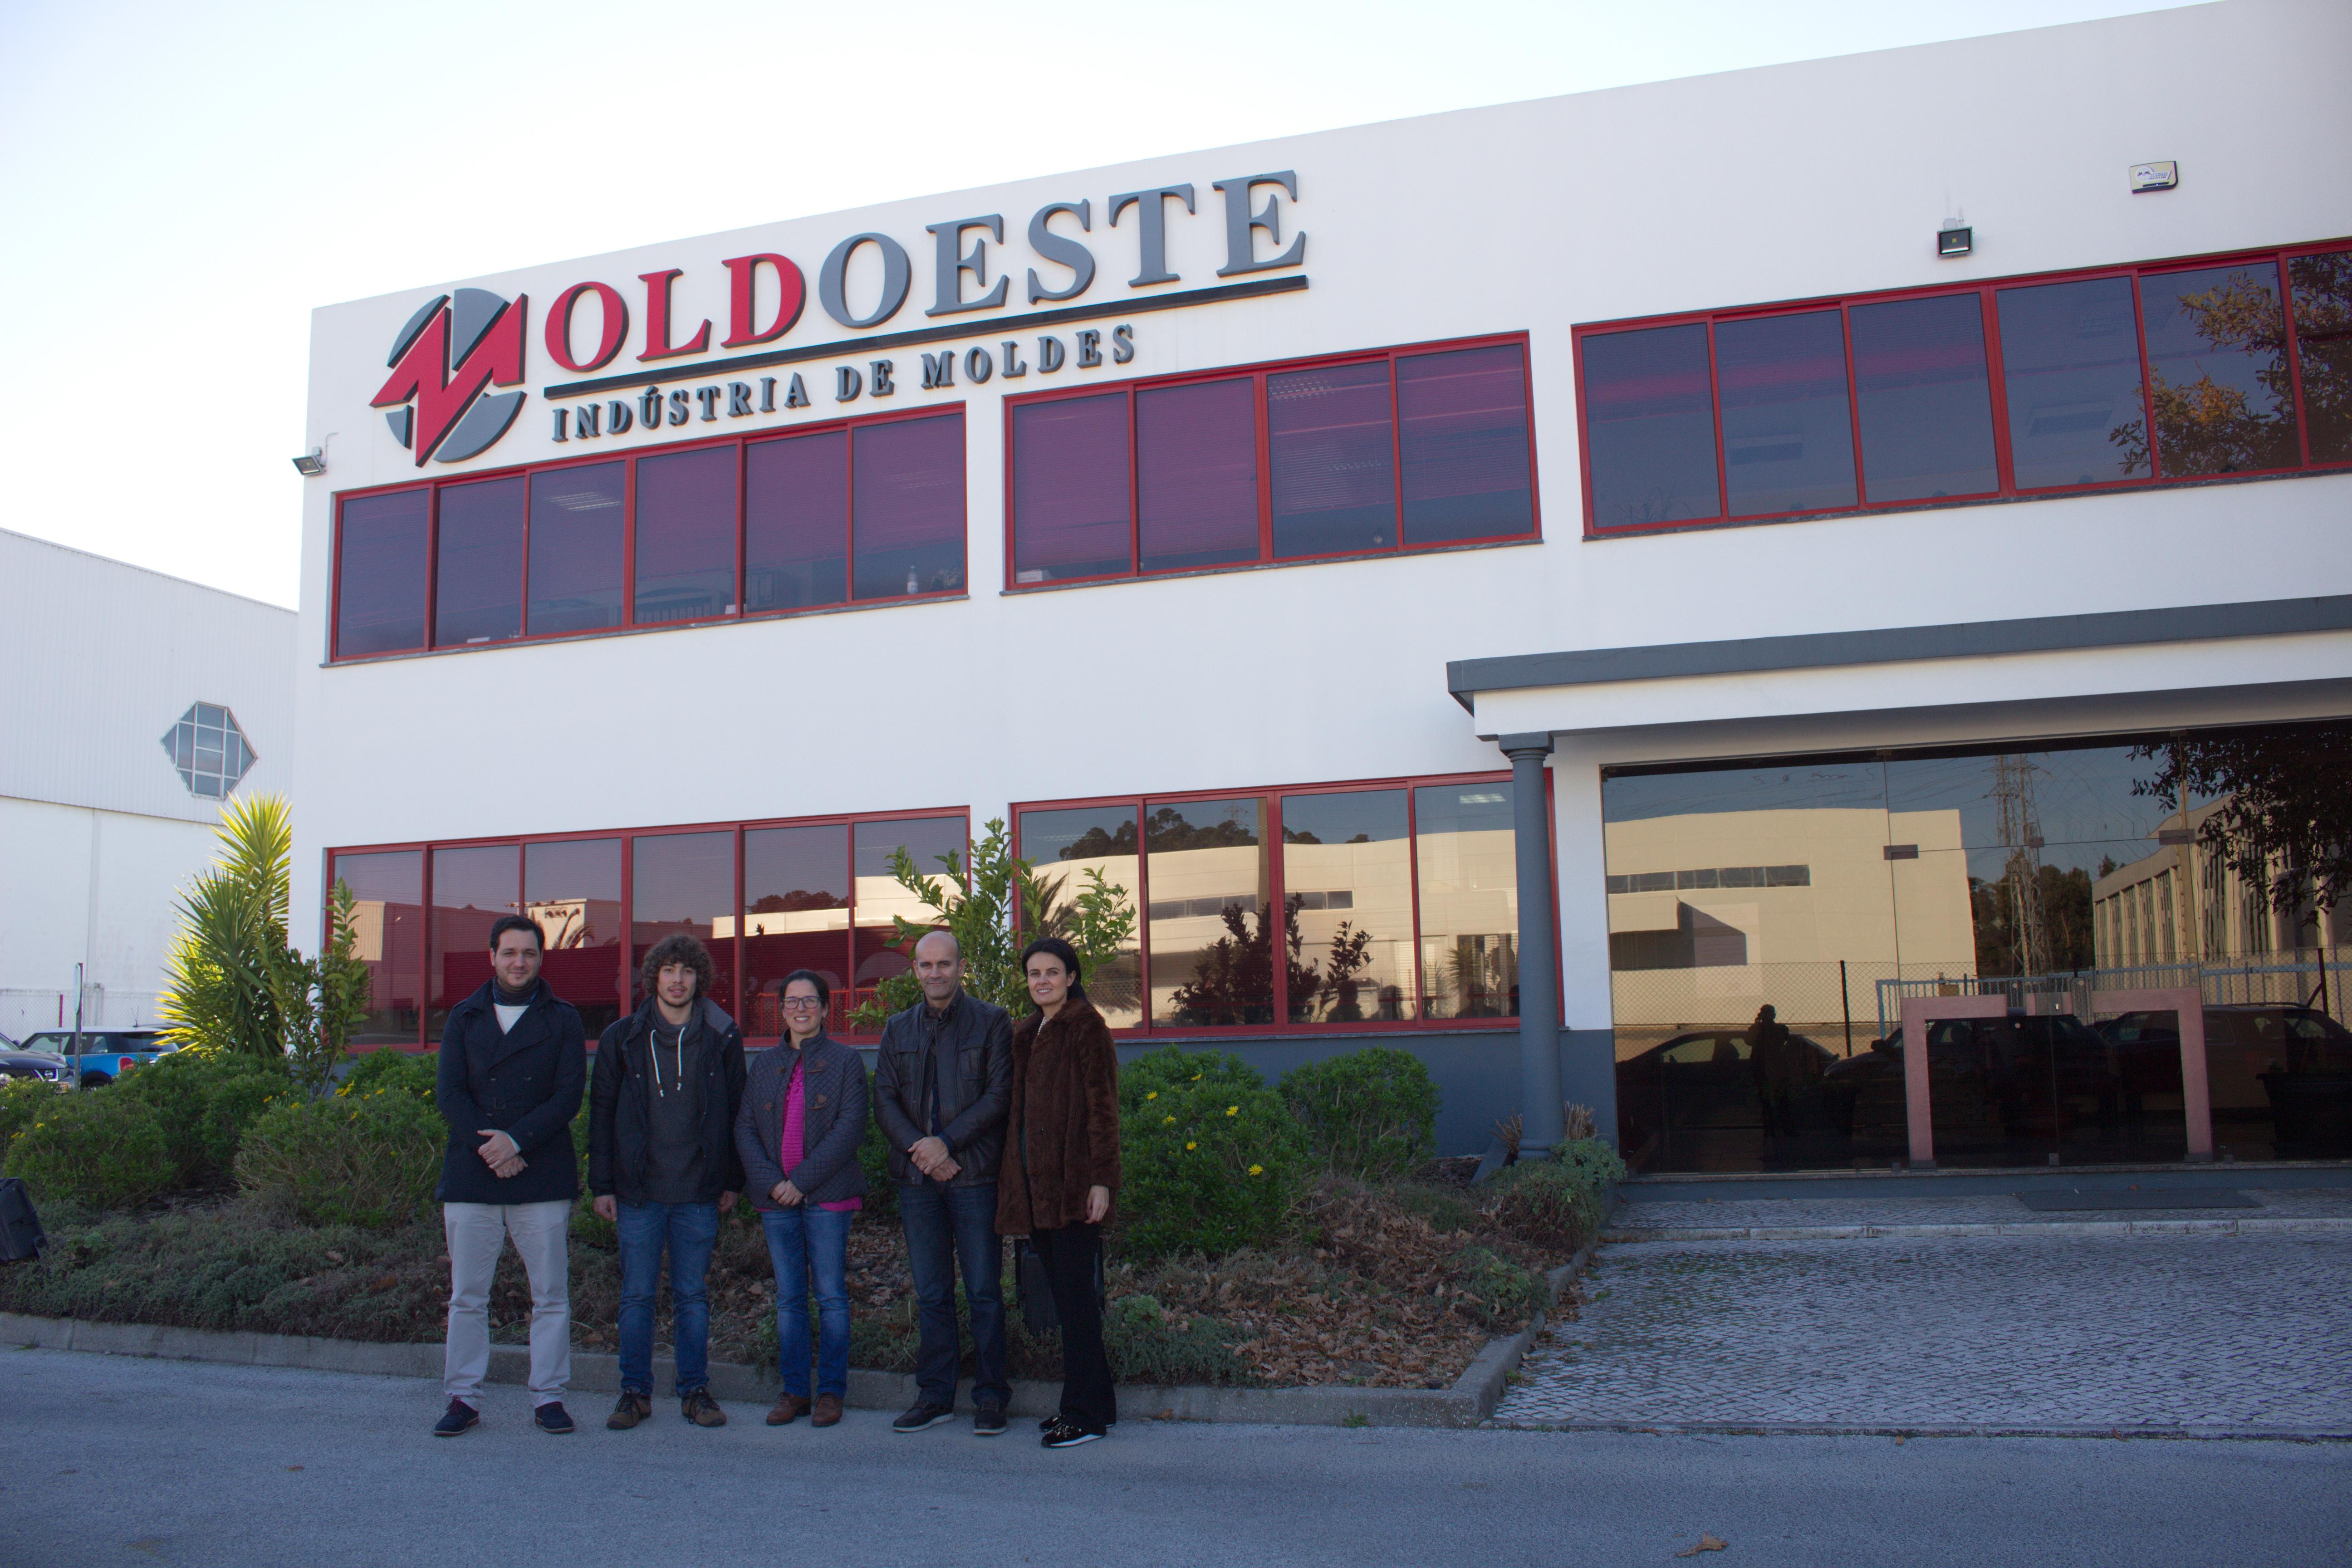 Visita à empresa MOLDOESTE